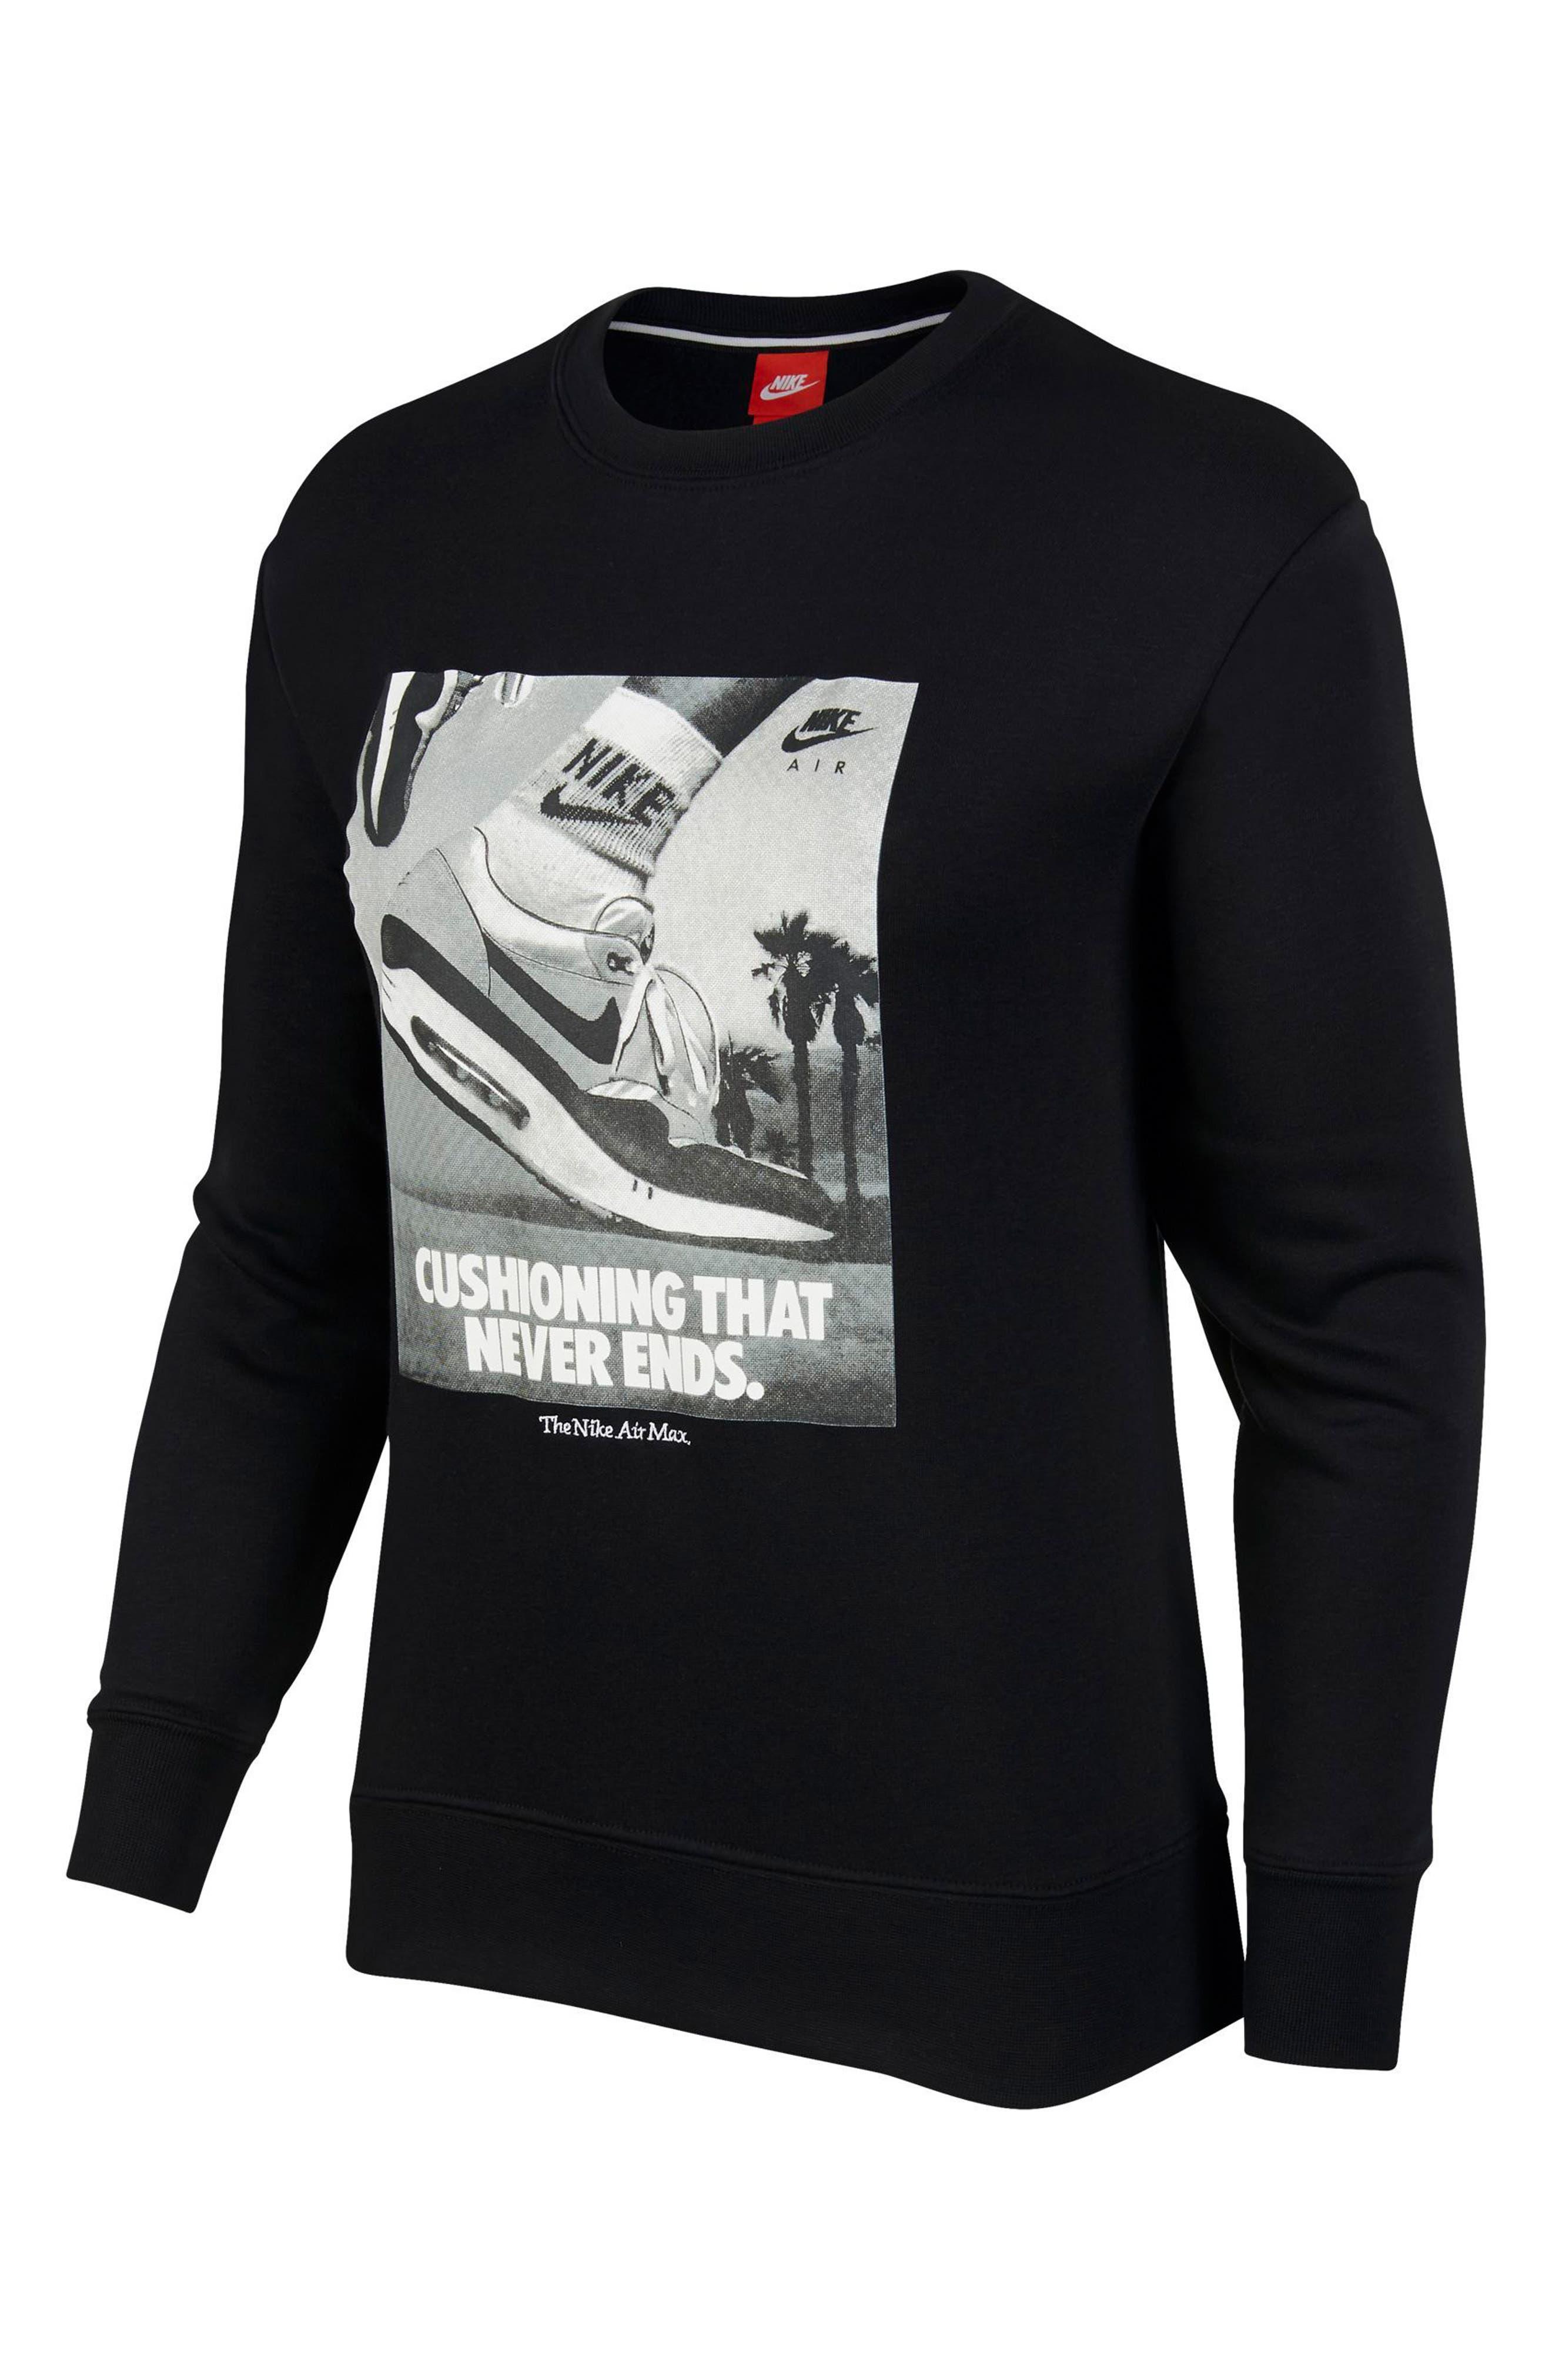 Sportswear Air Max 1 Women's Graphic Crewneck Sweatshirt,                             Main thumbnail 1, color,                             001